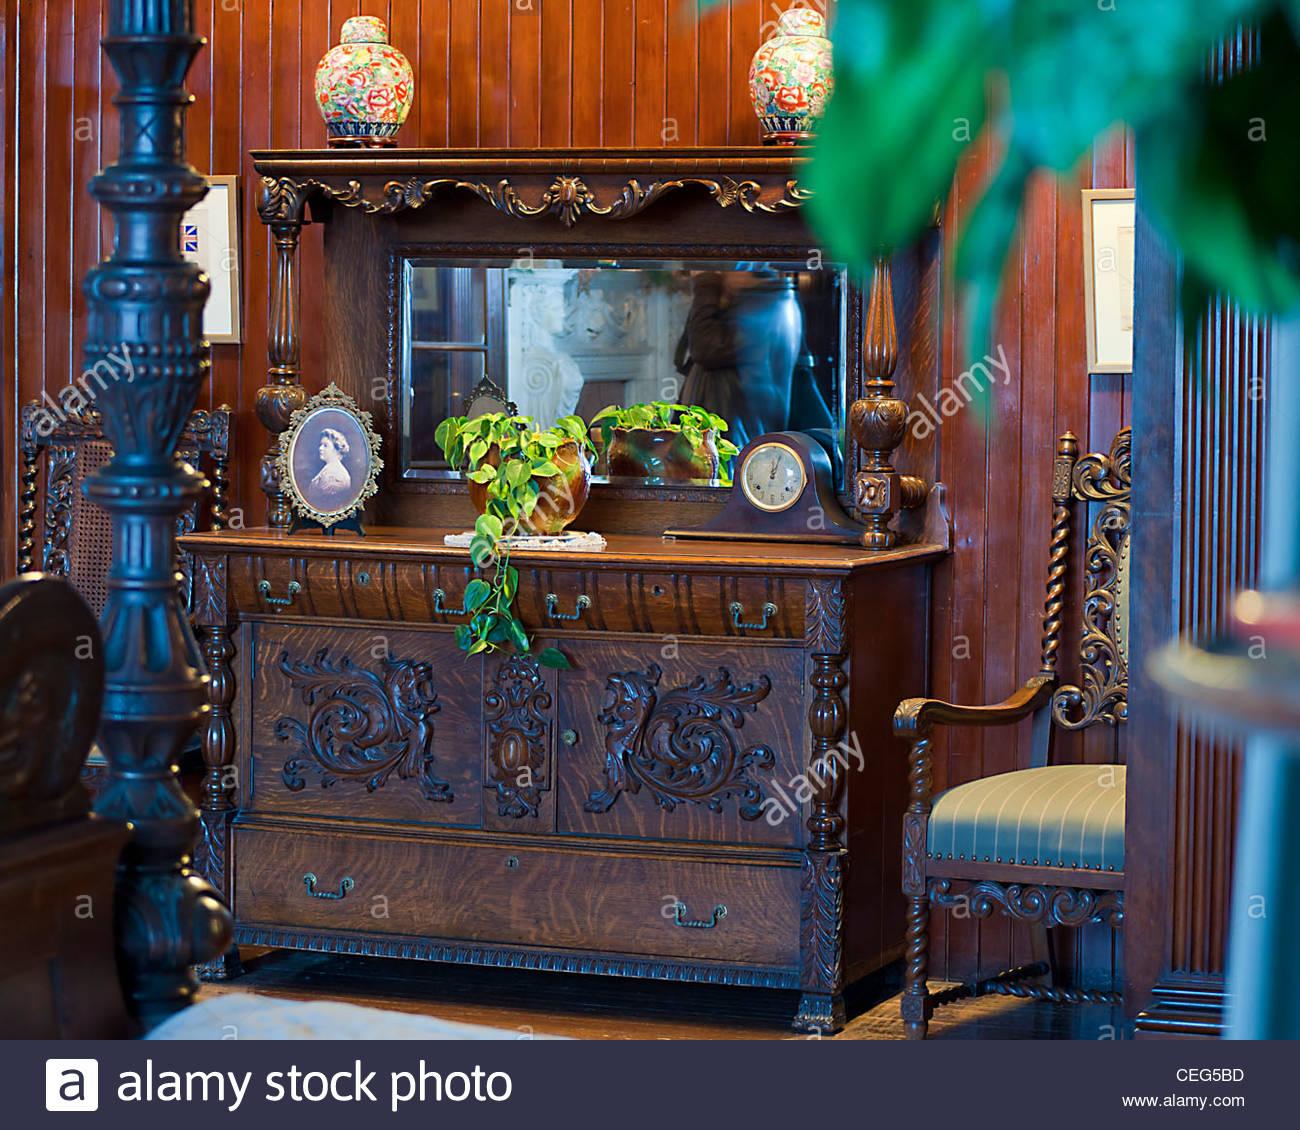 Henry Mill Palette Schlafzimmer in Casa Loma. Detail. Vintage ...